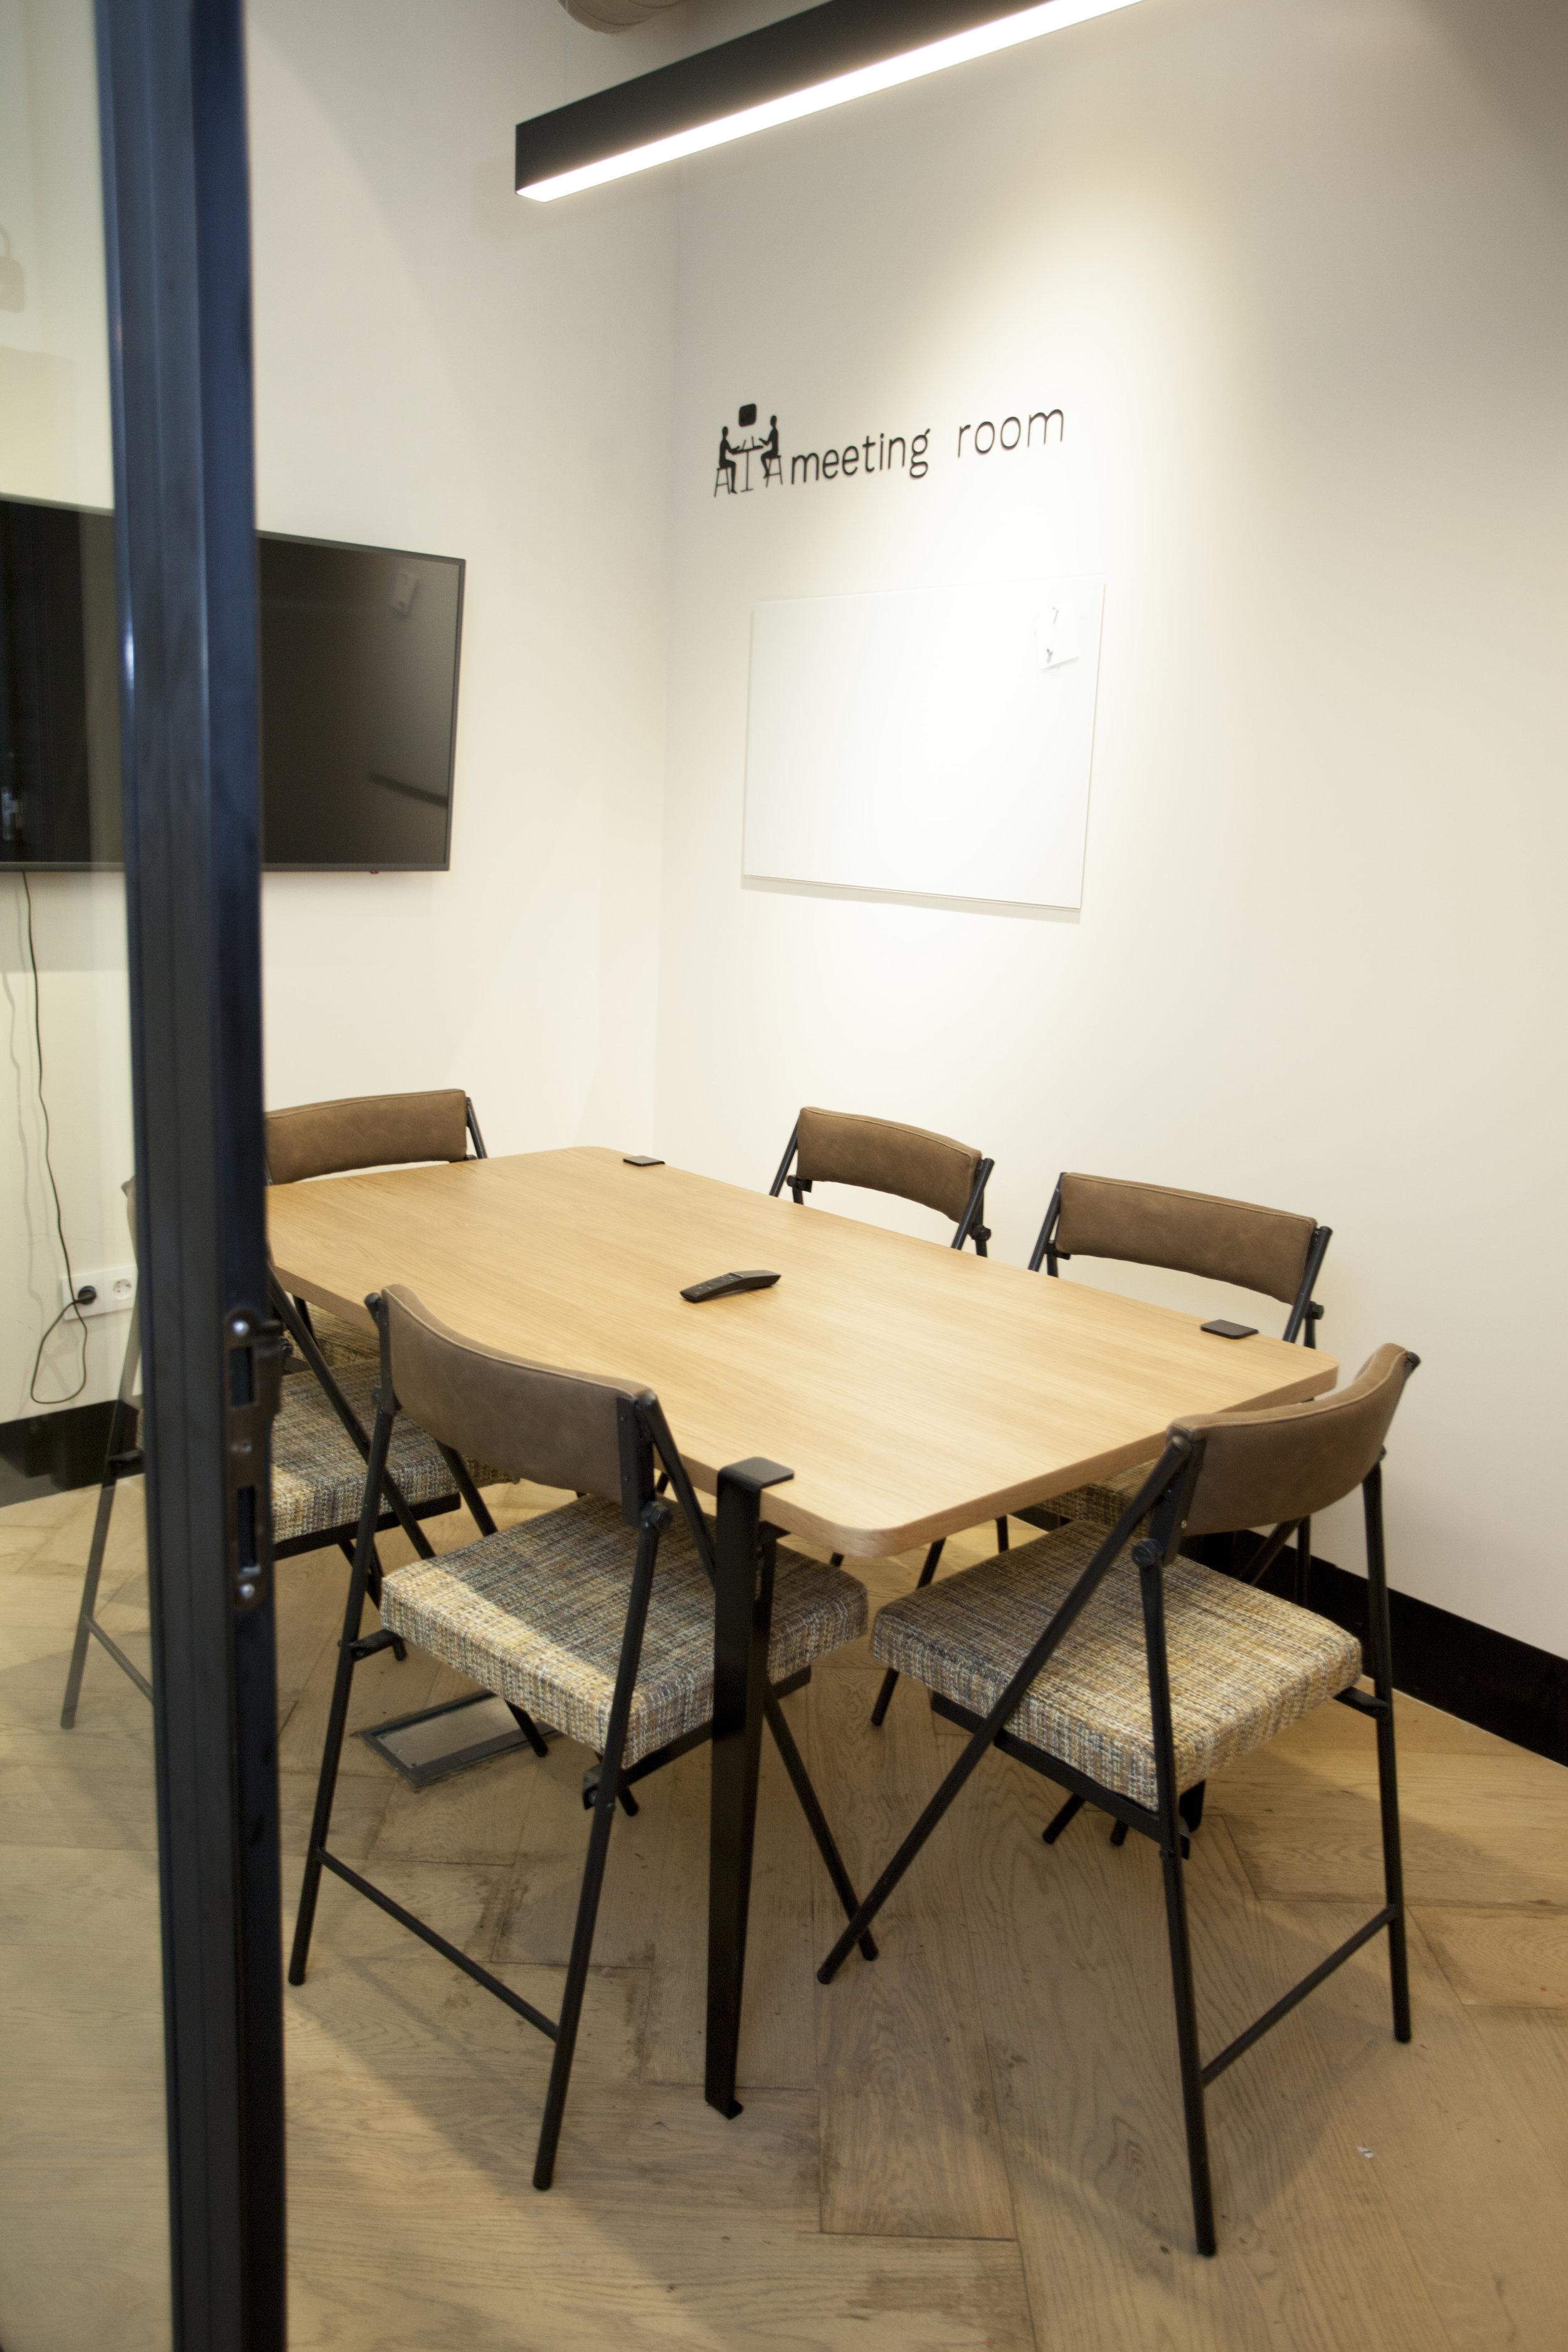 emmme studio restauracion Foodlab UrbanCampus meeting room.jpg